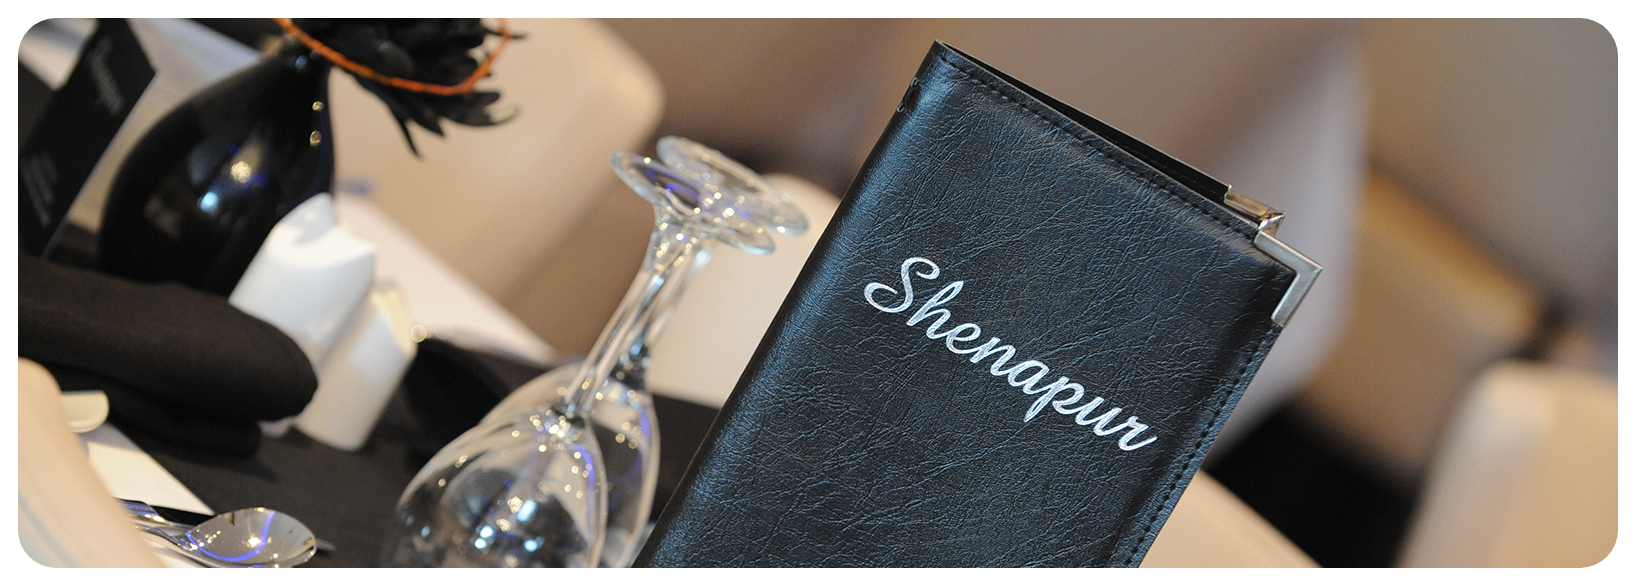 Shenapur Restaurant & Takeaway